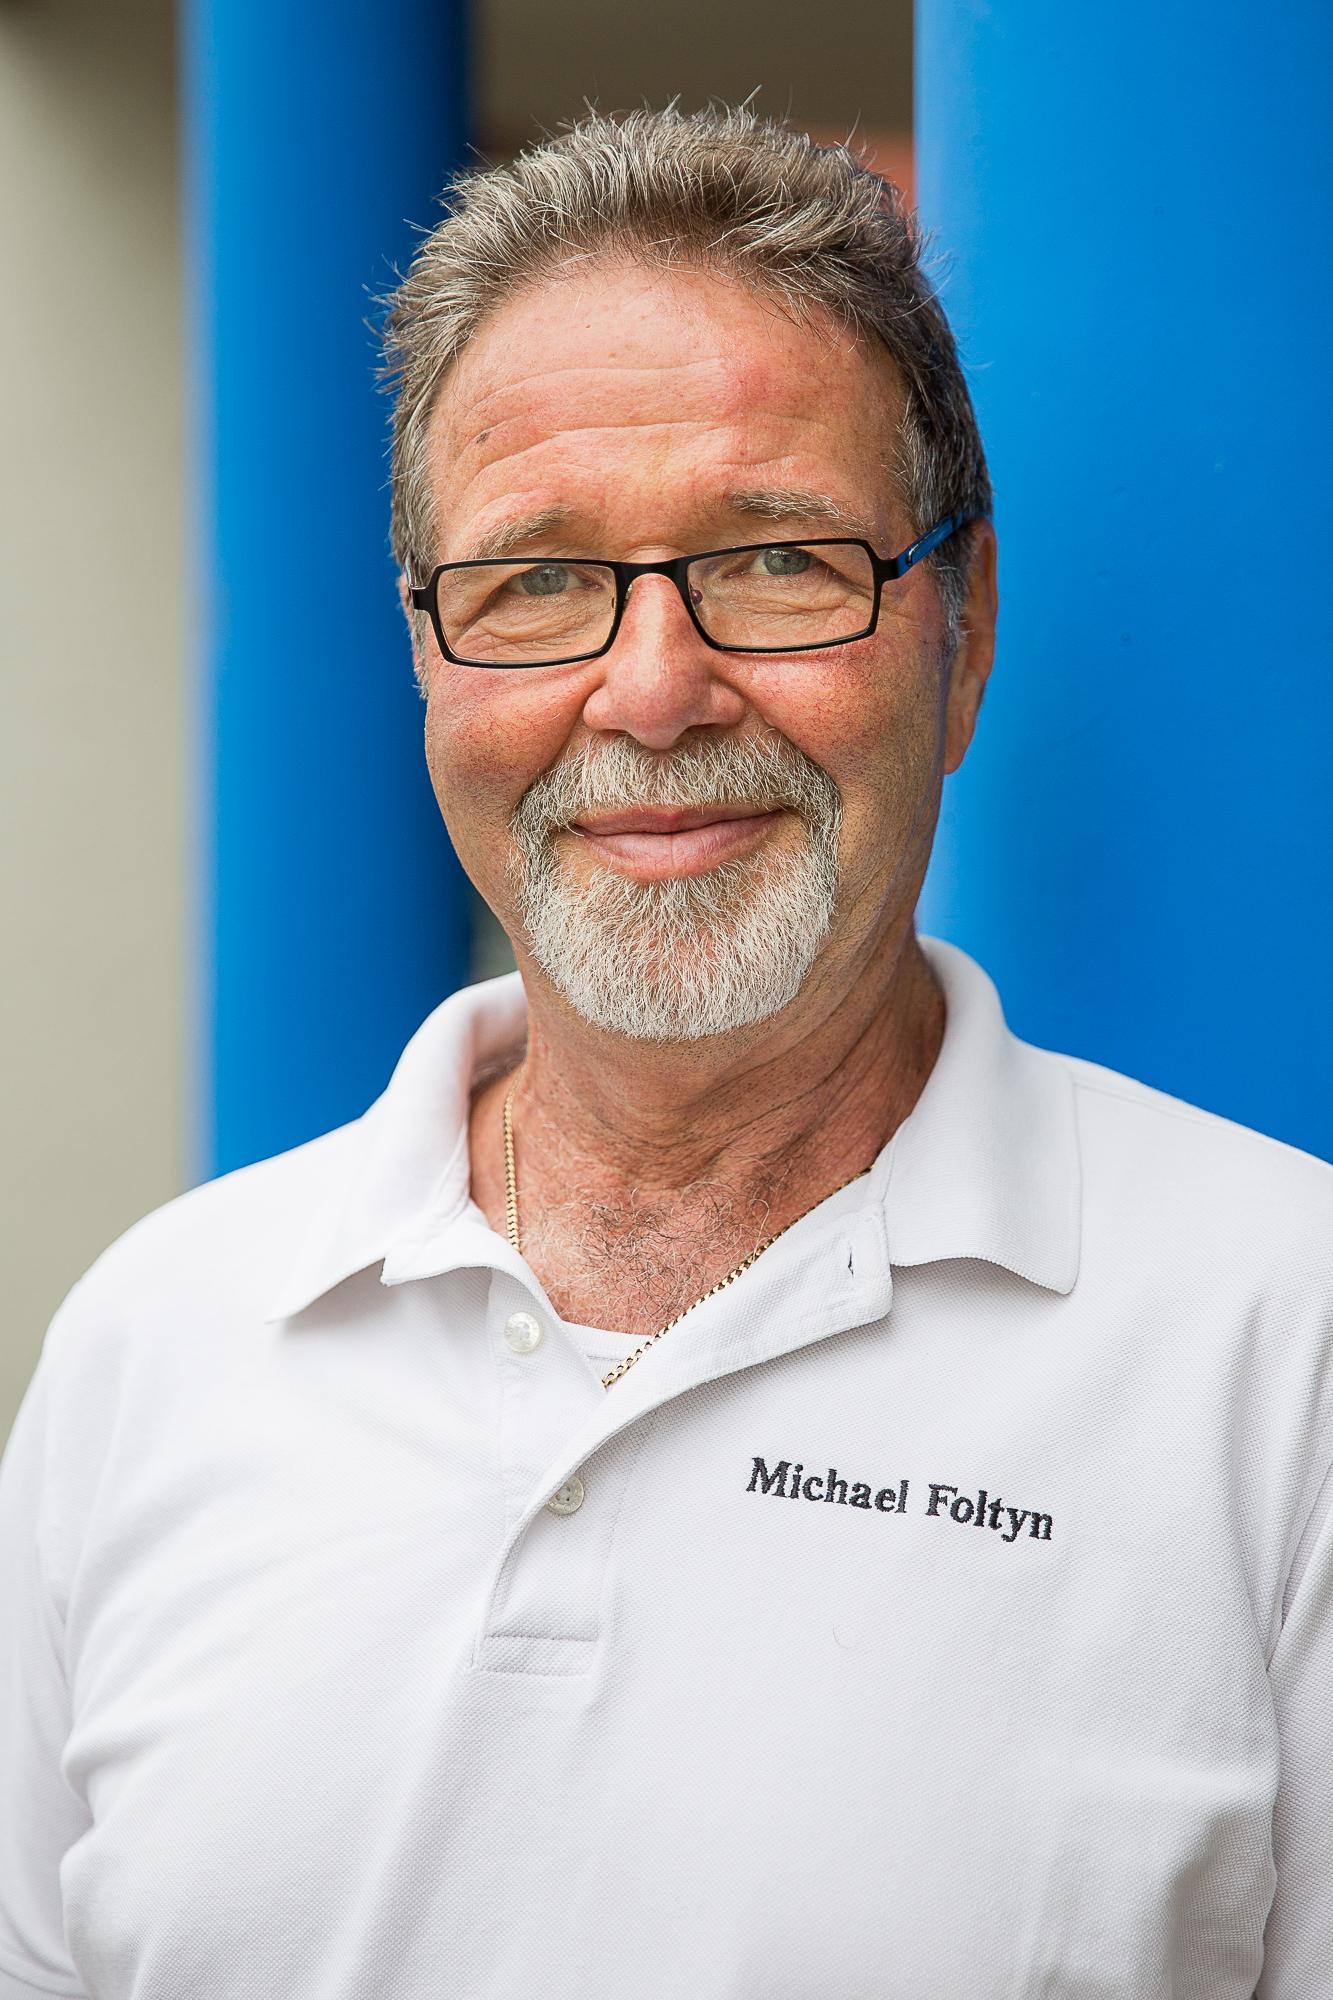 Michael Foltyn